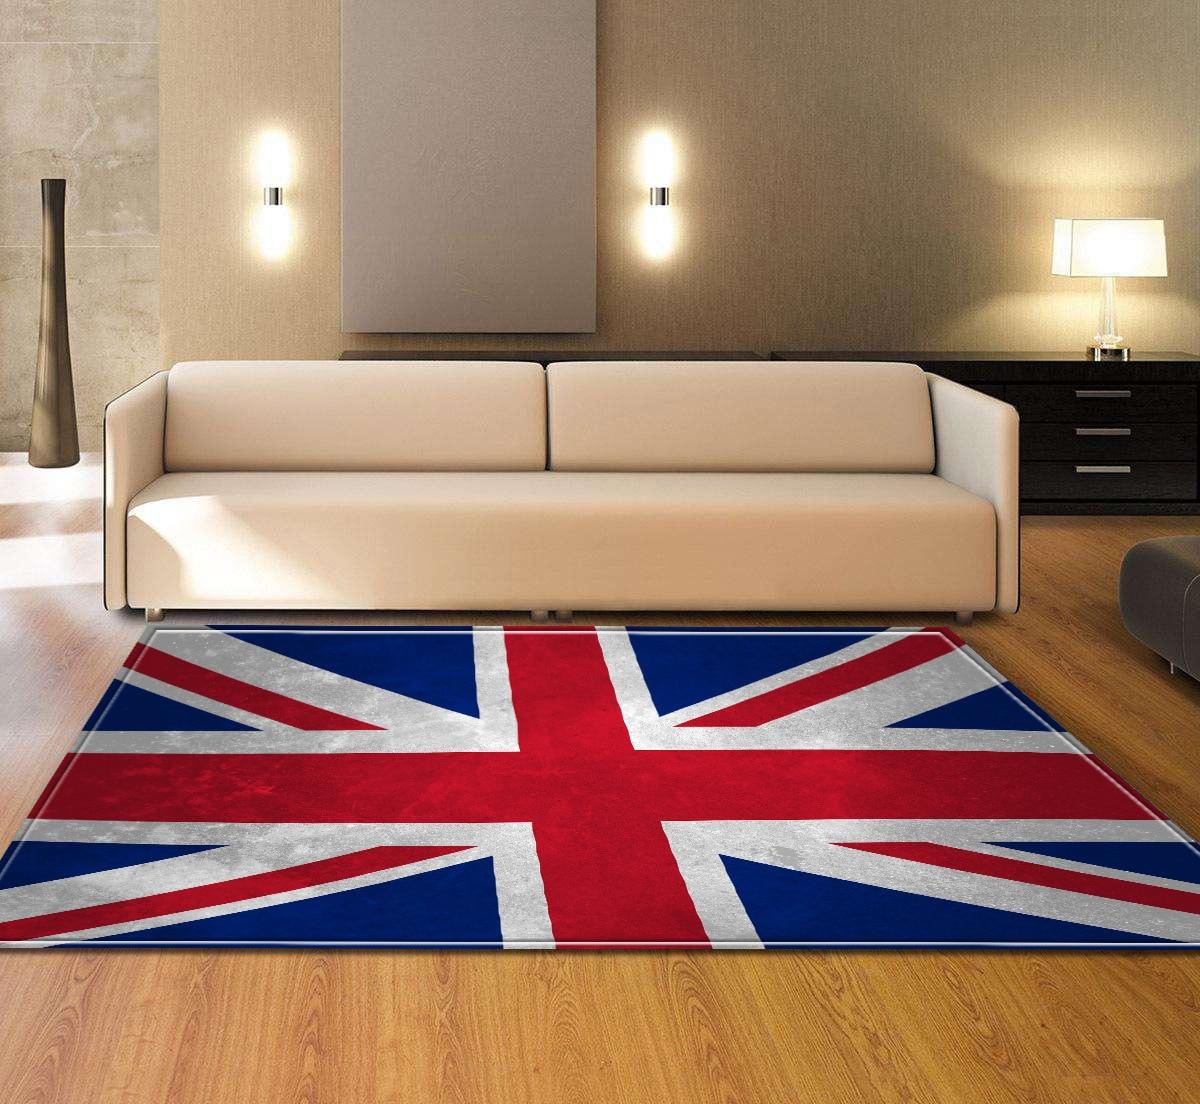 Zeegle Europe Soft Carpet For Living Room Bedroom Rugs Kid Play Delicate Mats Home Study Room Sofa Table Floor Mats